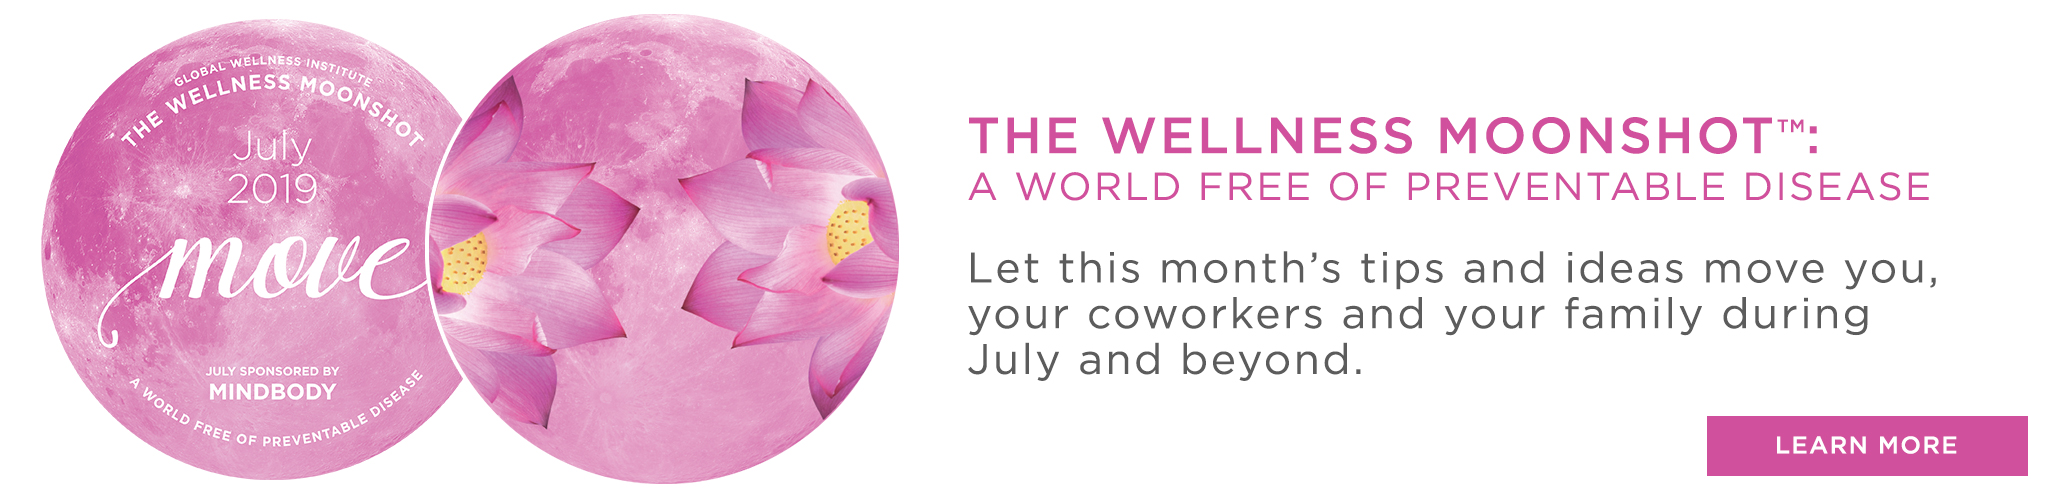 July Wellness Moonshot